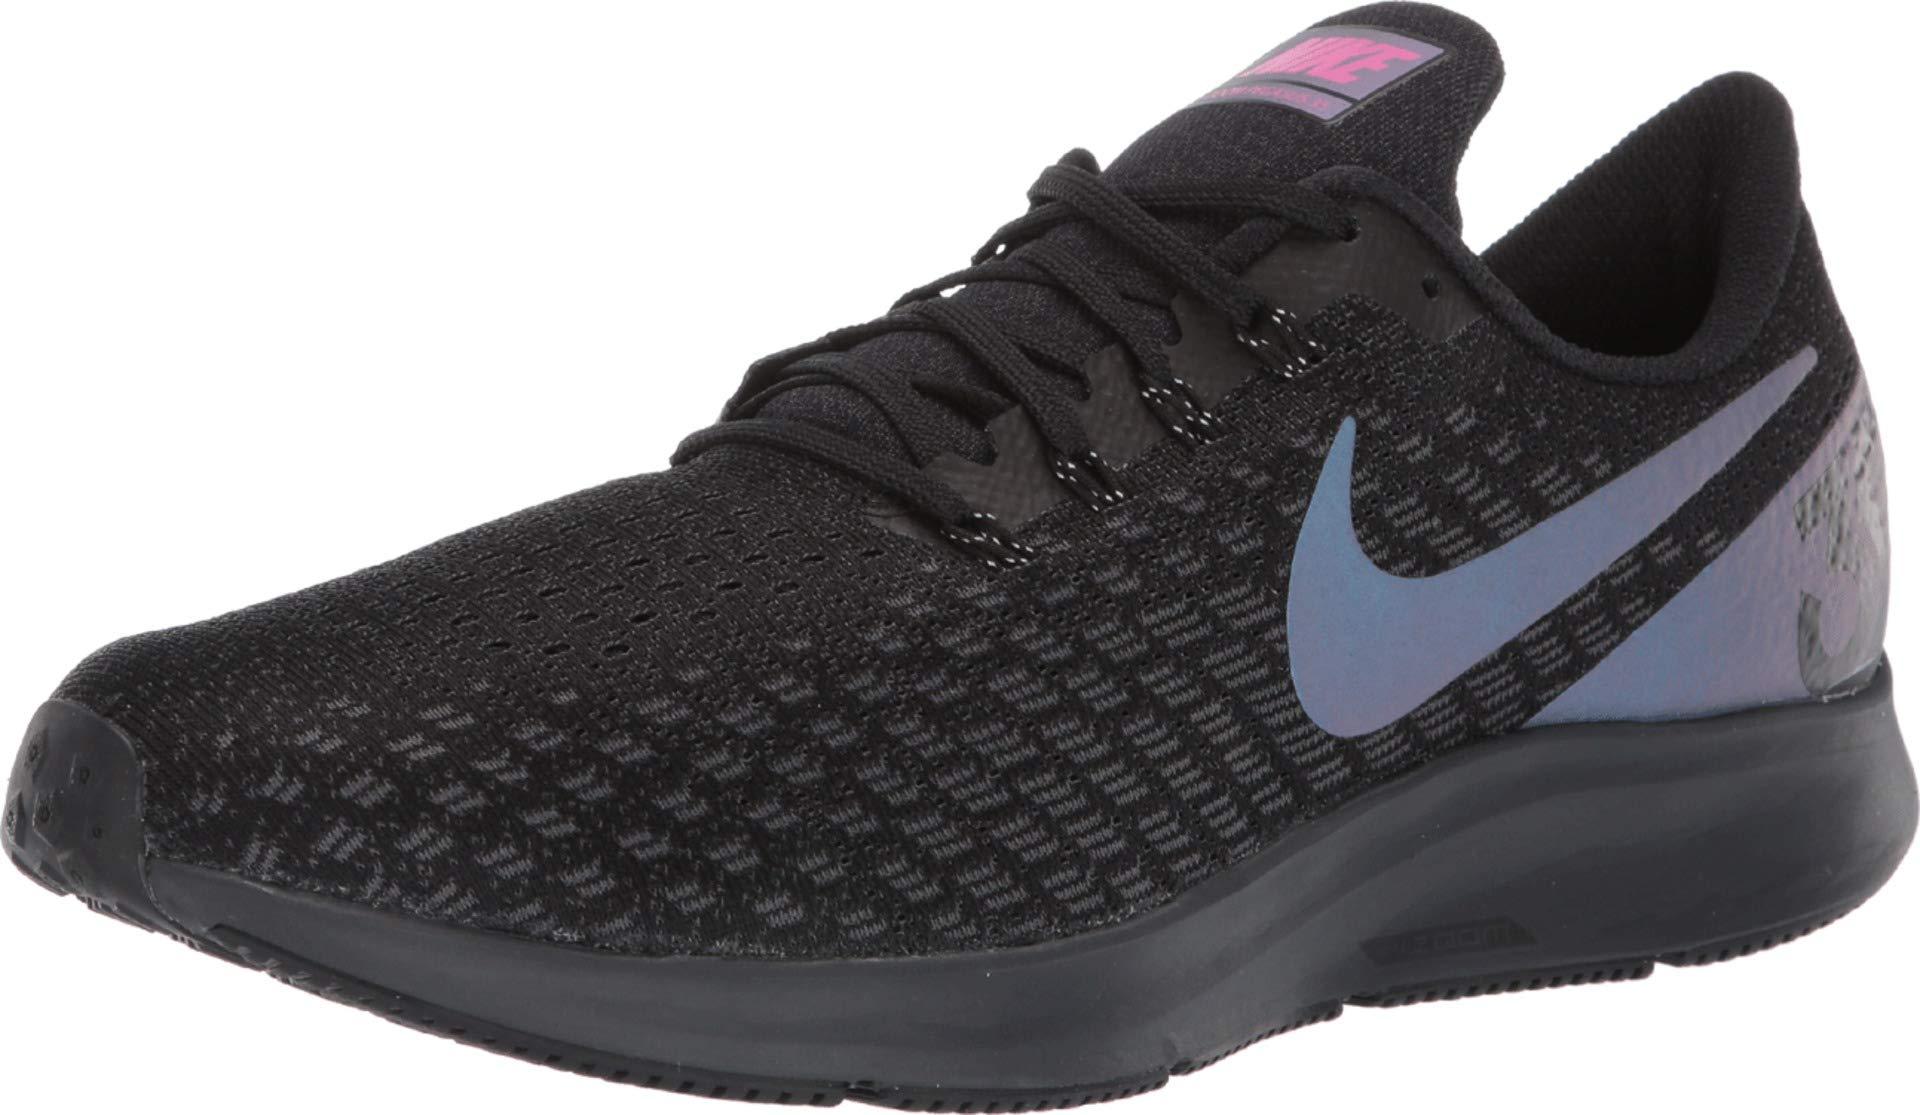 Nike Men's Air Zoom Pegasus 35 Running Shoes, Black/Laser Fuchsia-Anthracite (US 10.5)